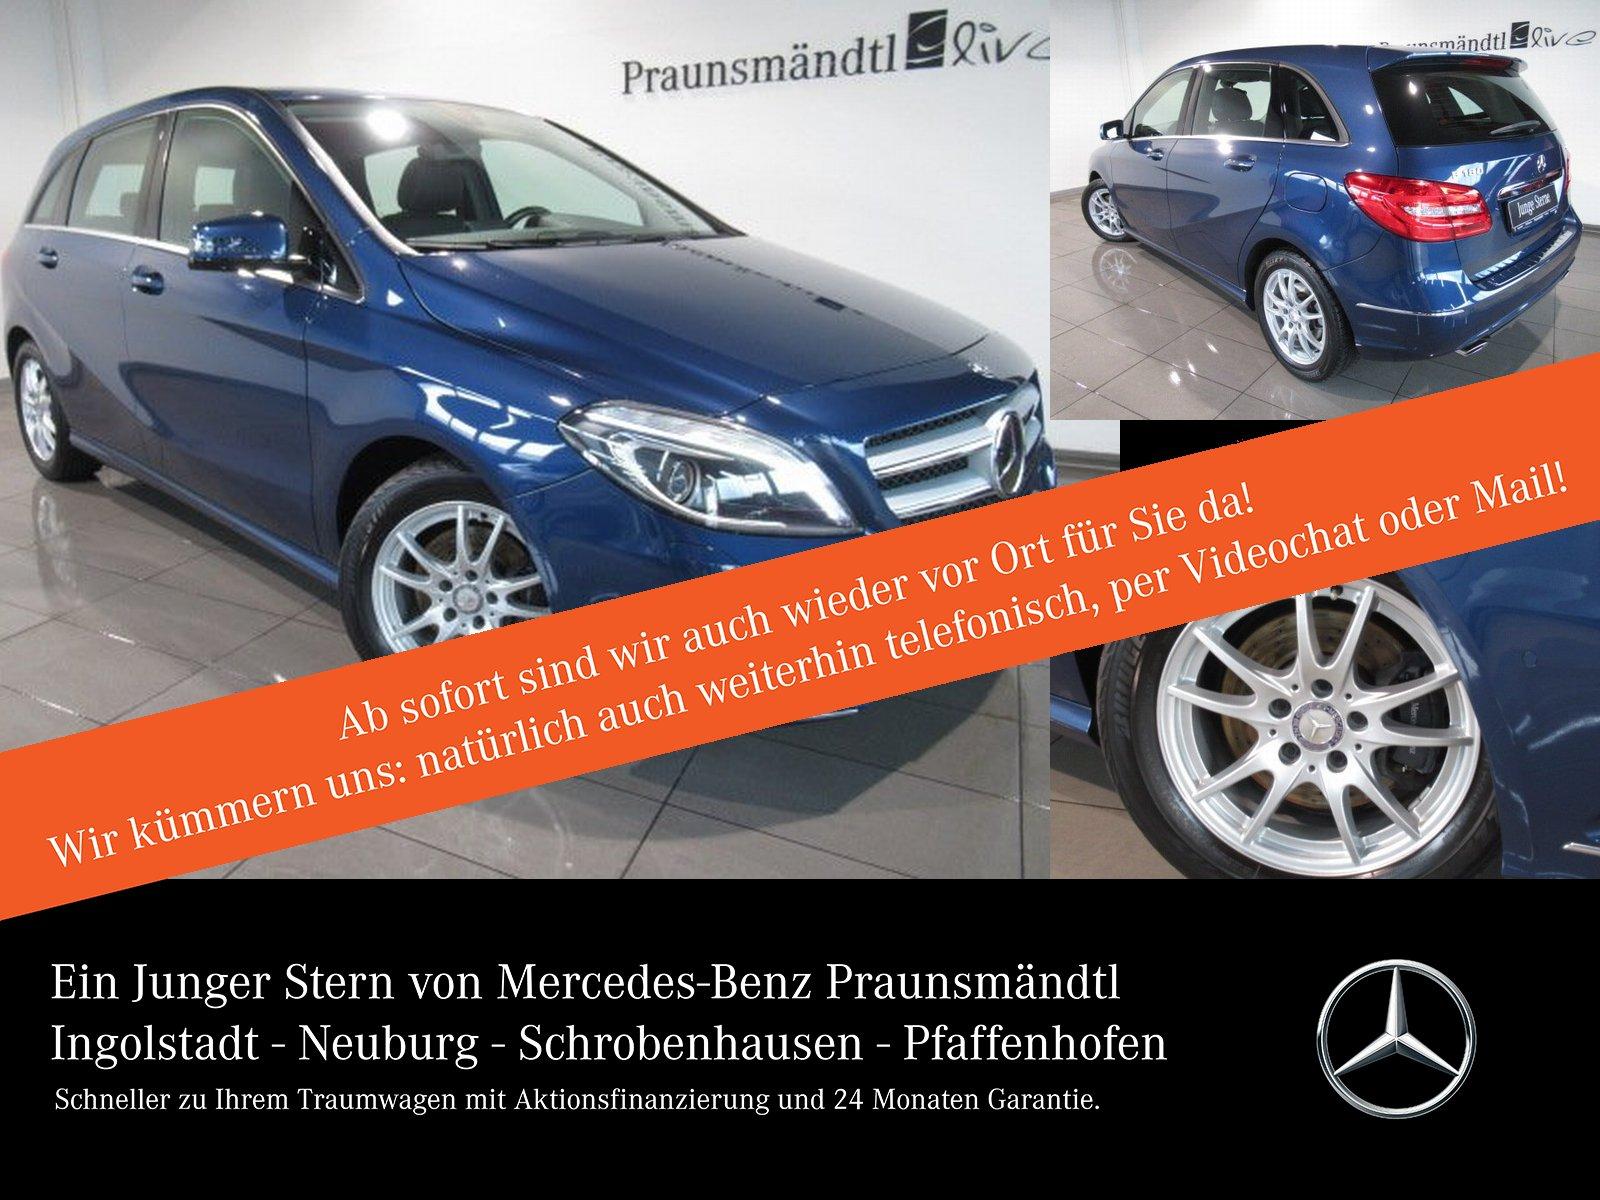 Mercedes-Benz B 180 CDI Sportpaket Navi/Kamera/Xenon/SHZ/PTS, Jahr 2012, Diesel